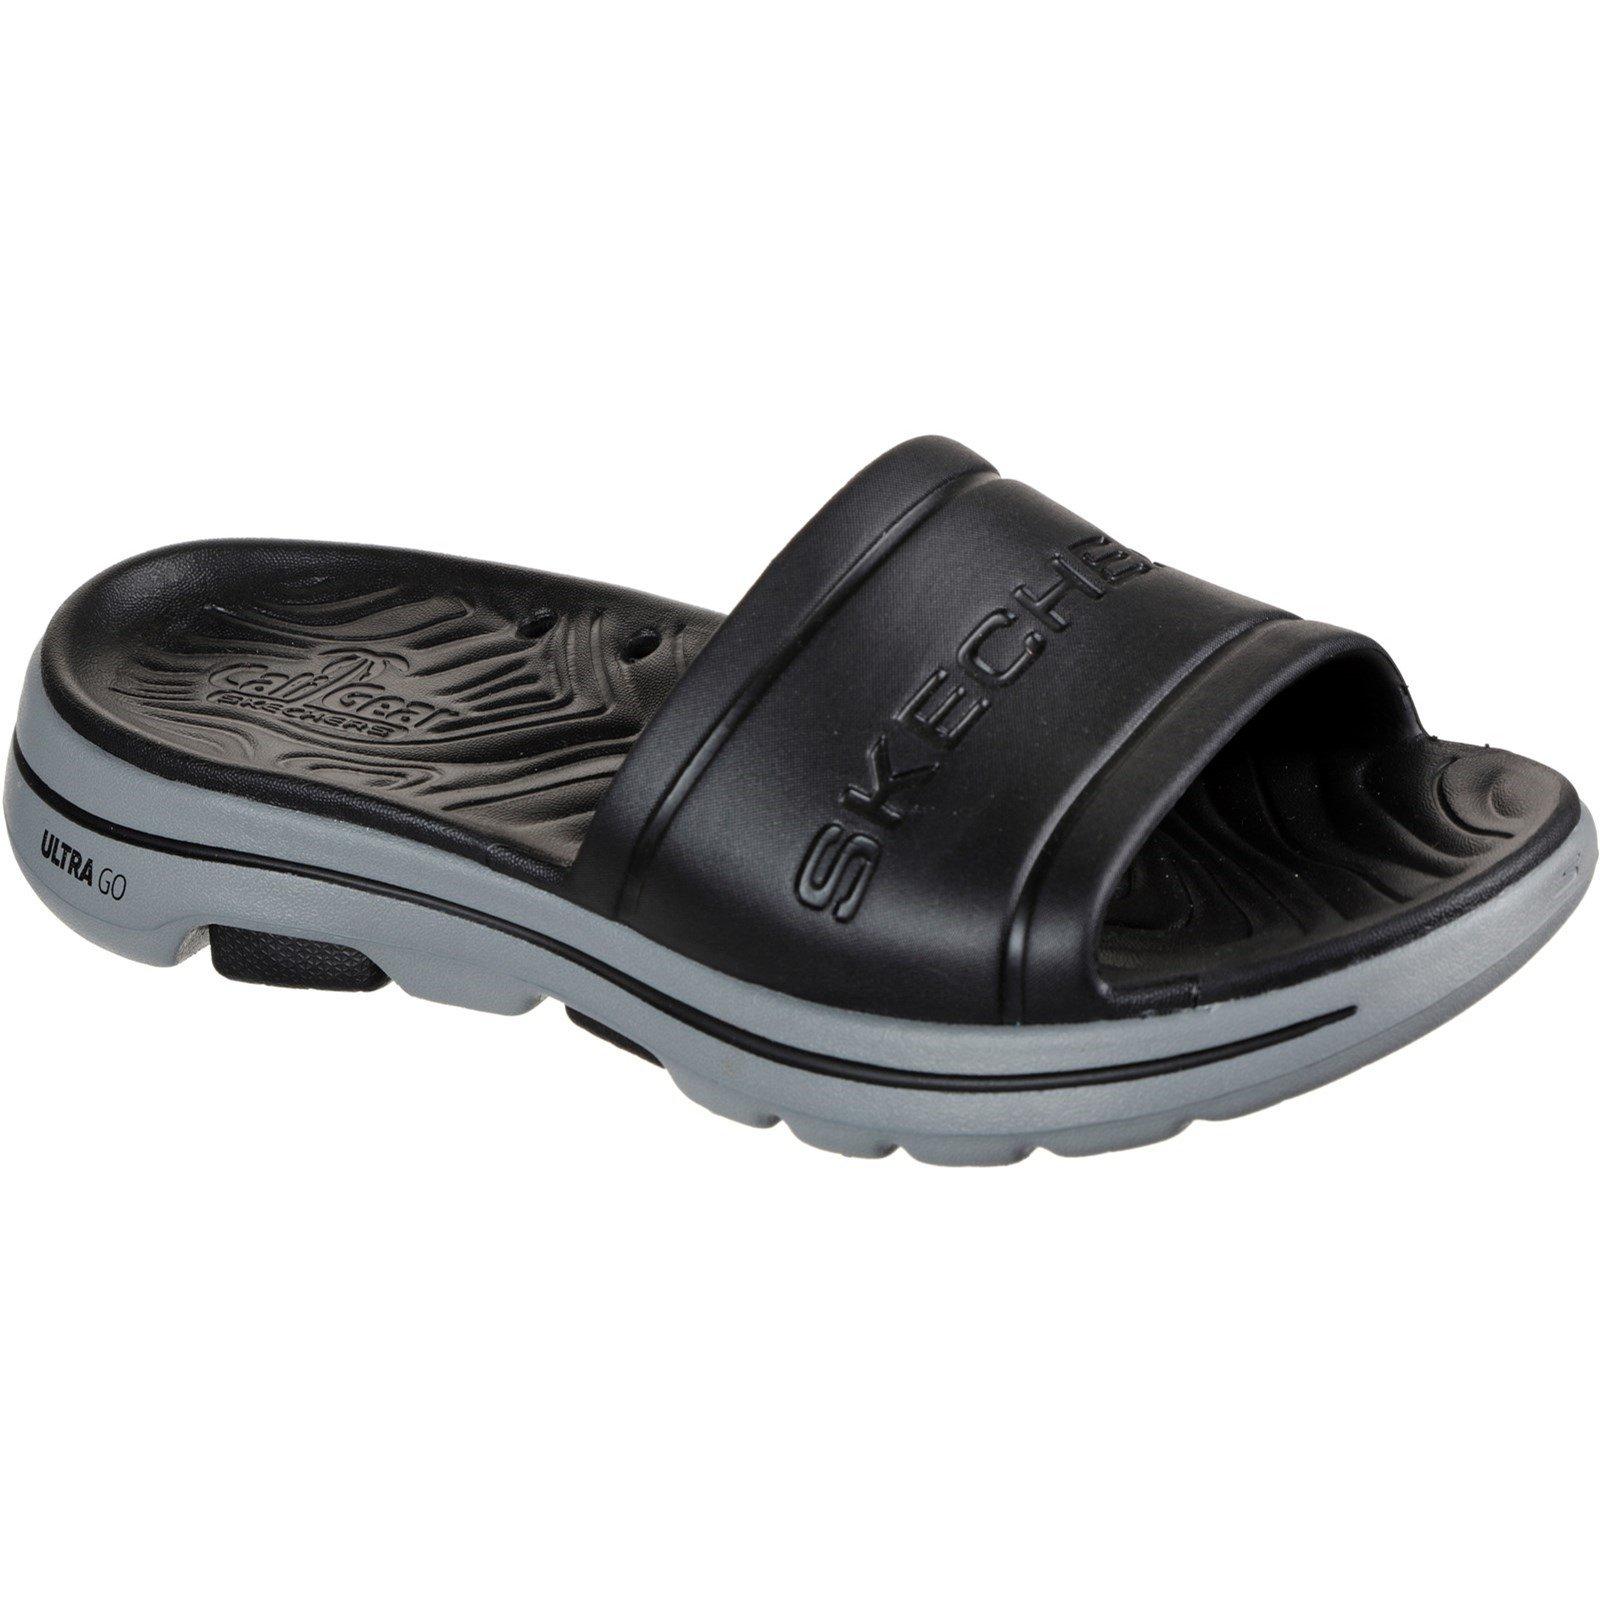 Skechers Men's Go Walk 5 Surfs Out Summer Sandal Various Colours 32207 - Black/Grey 8